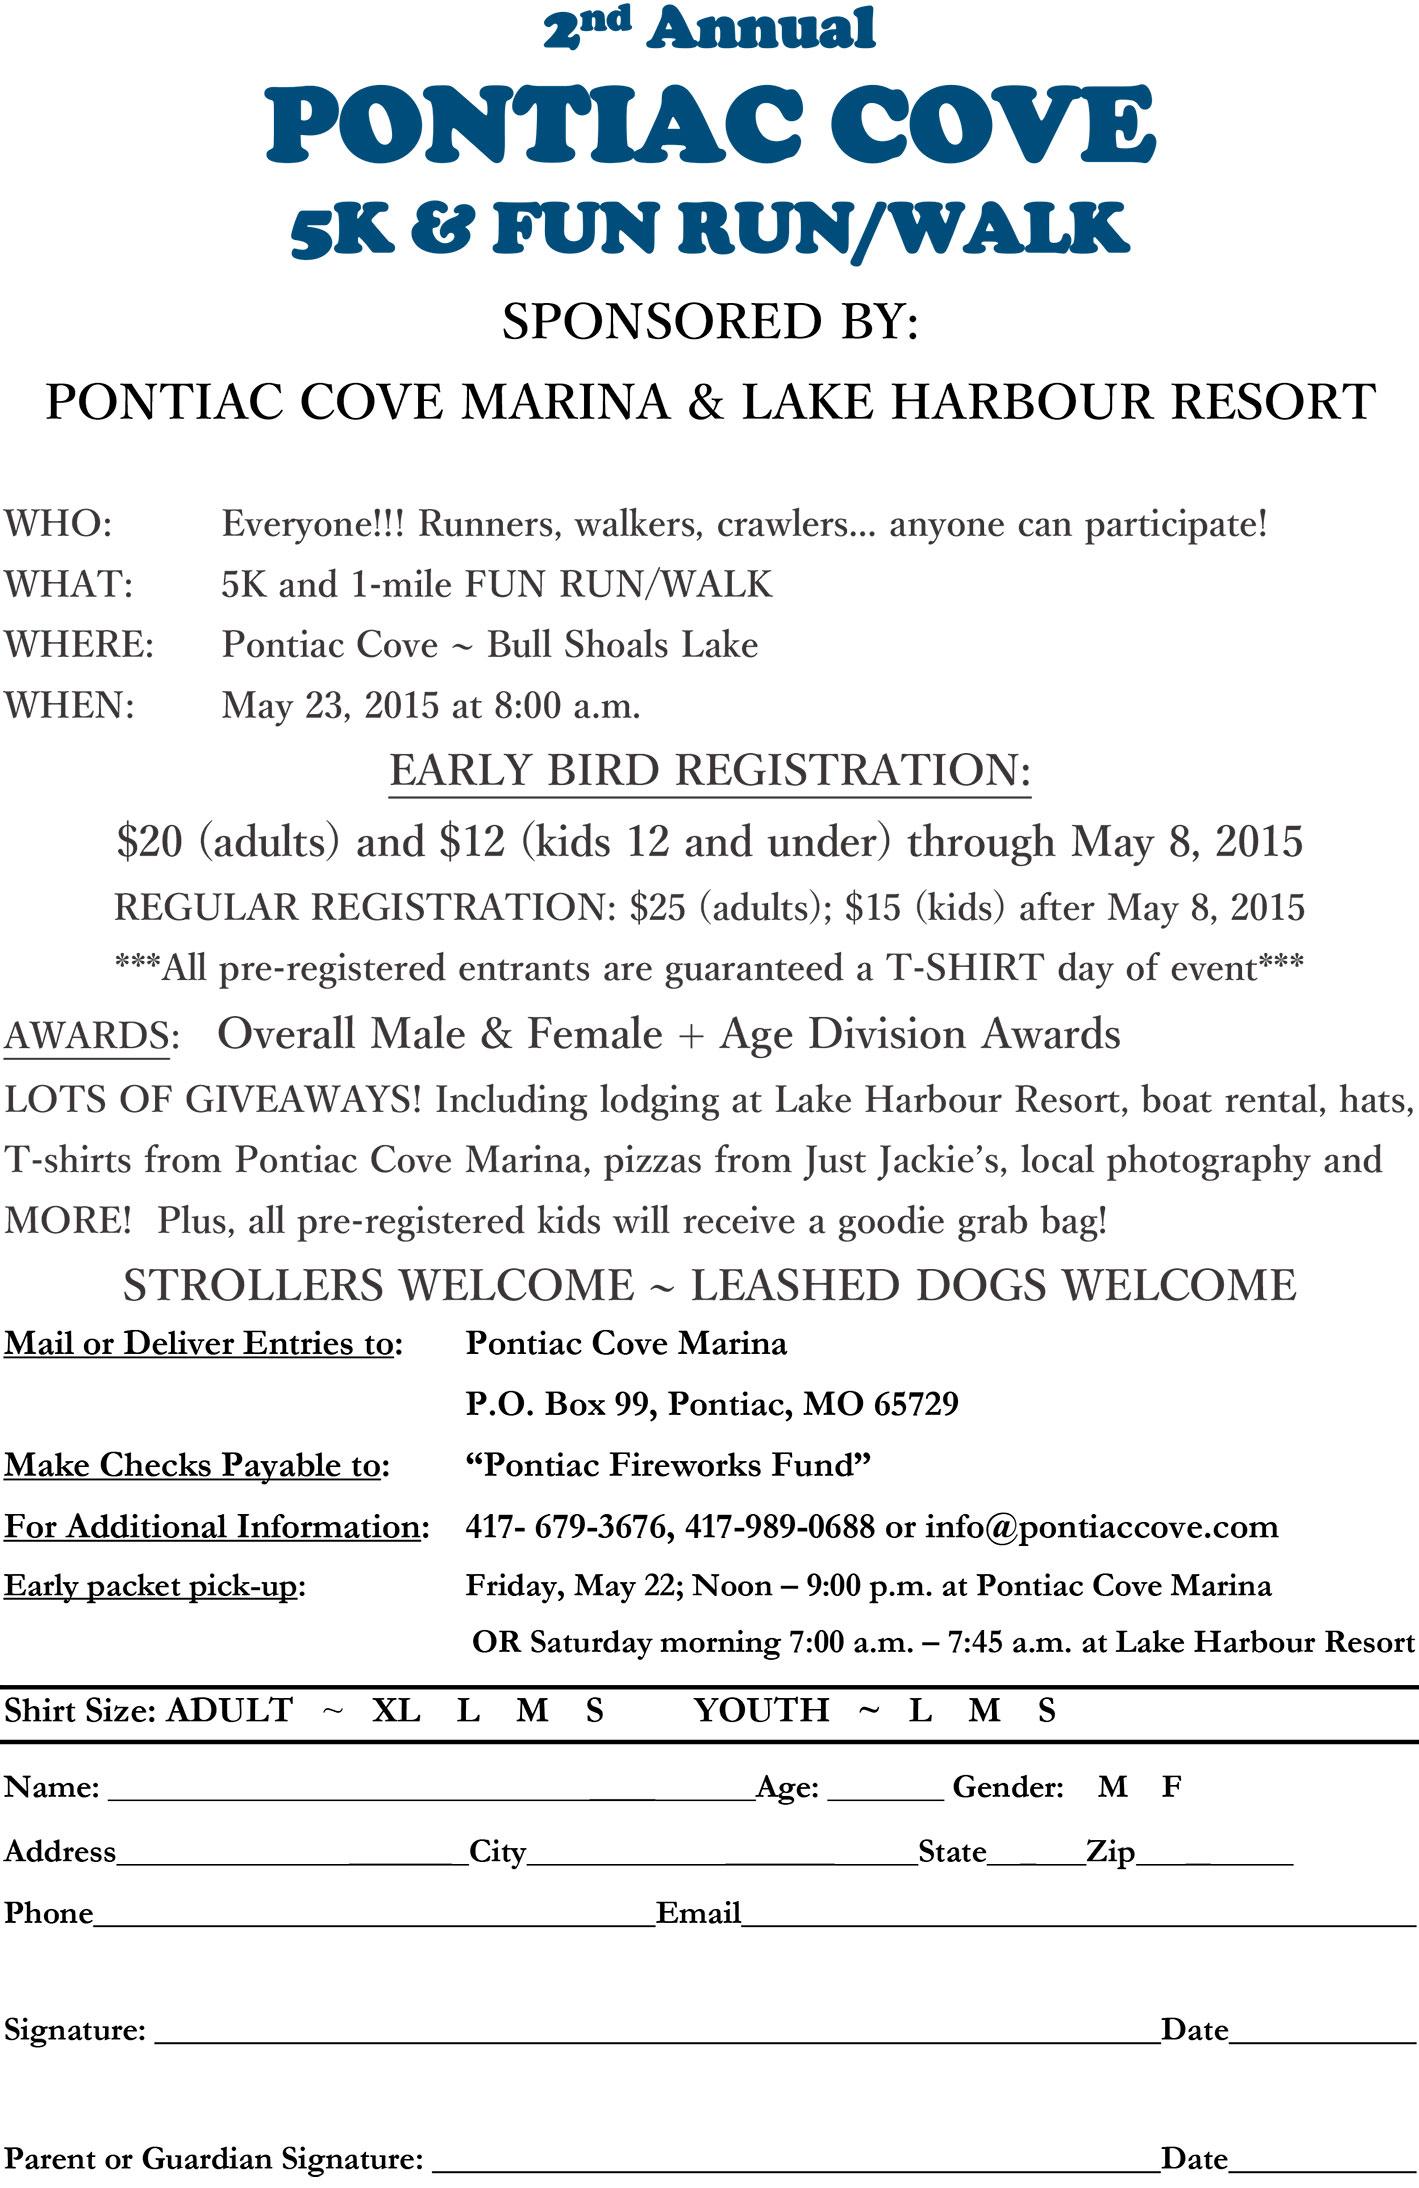 Register for thePontiac Cove 5K & Fun Run/Walk.